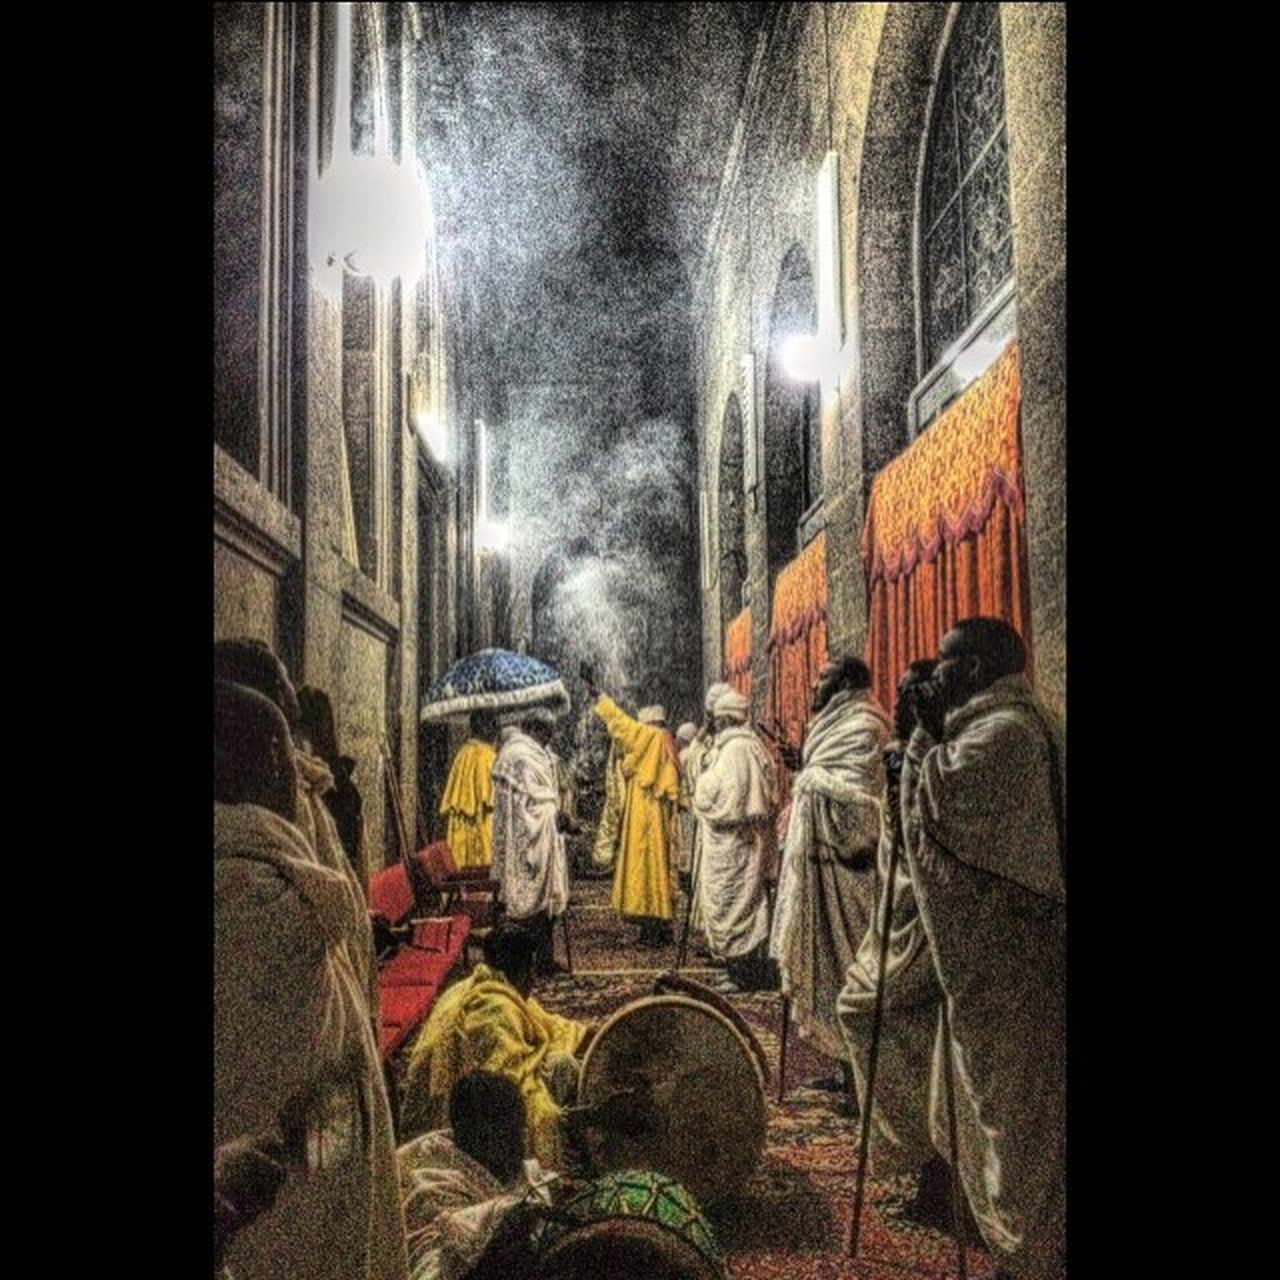 AddisPicOfTheDay Picoftheday TsomeFilseta Filseta Bahita Monastery Kazanchis EthiopianPriest EthiopianOrthodox EthiopianOrthodoxTewahedoChurch Addis  Addisababa Ethiopia Ethiopian Africa Everydayafrica BirukGerbiPhotography